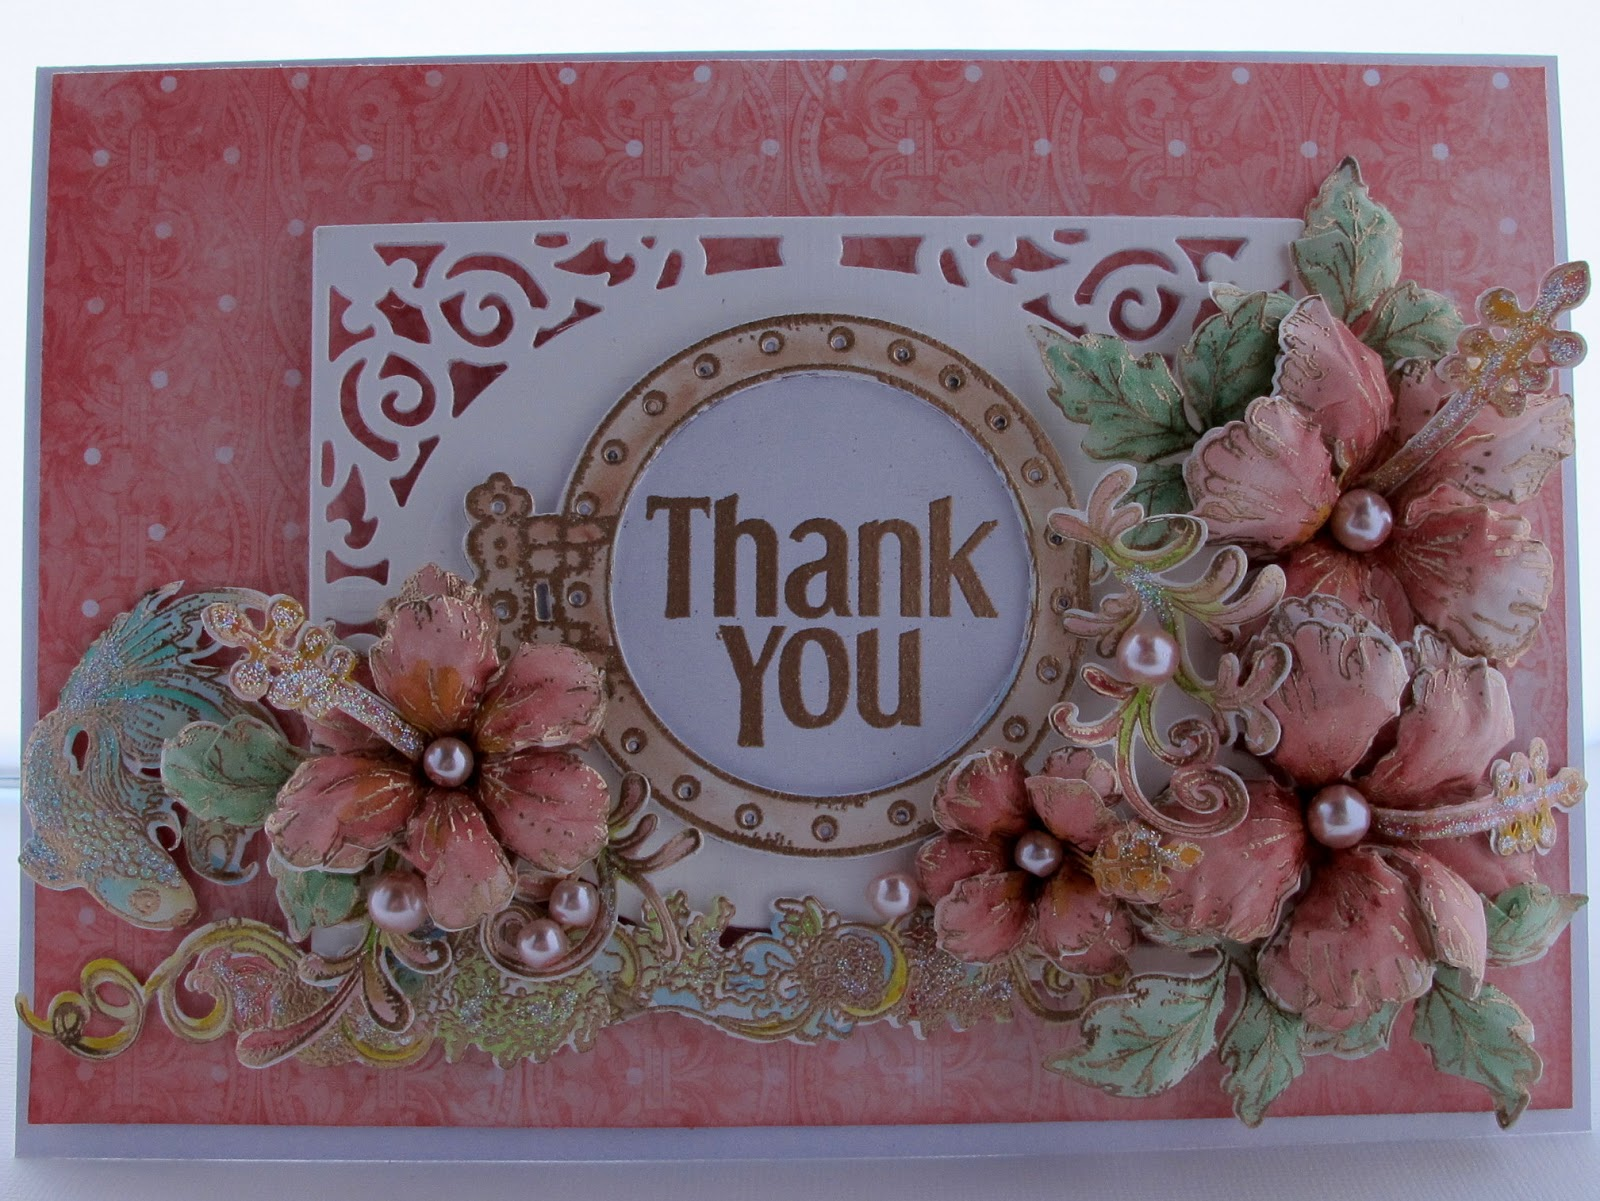 susan smit heartfelt creatoinsthank you card